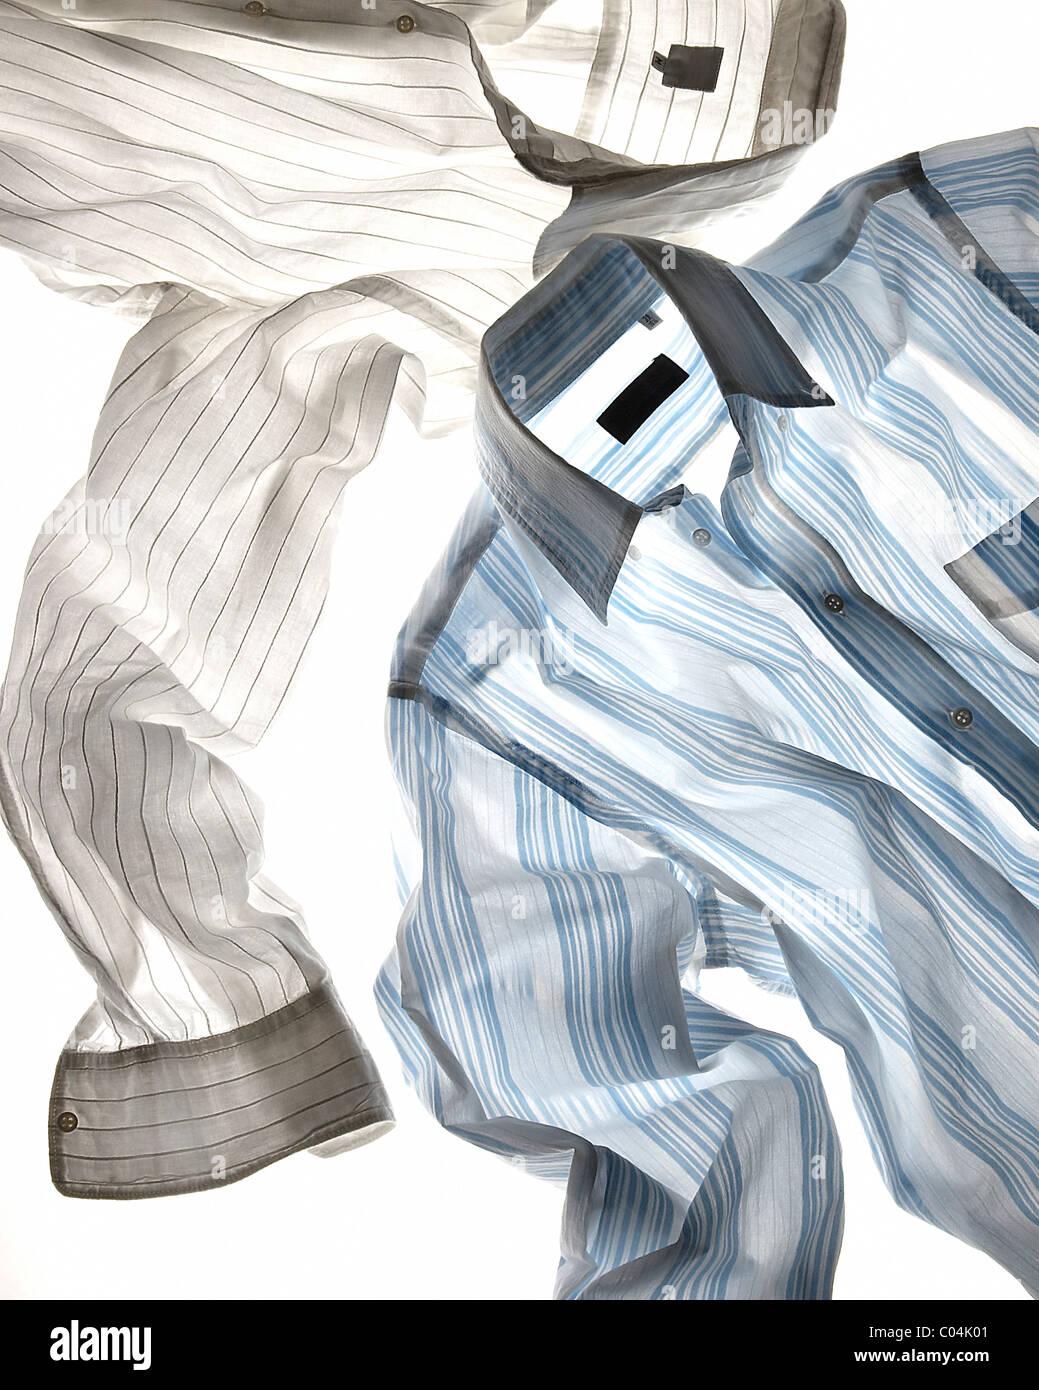 Bianco e blu Camicia a Righe baklite Immagini Stock